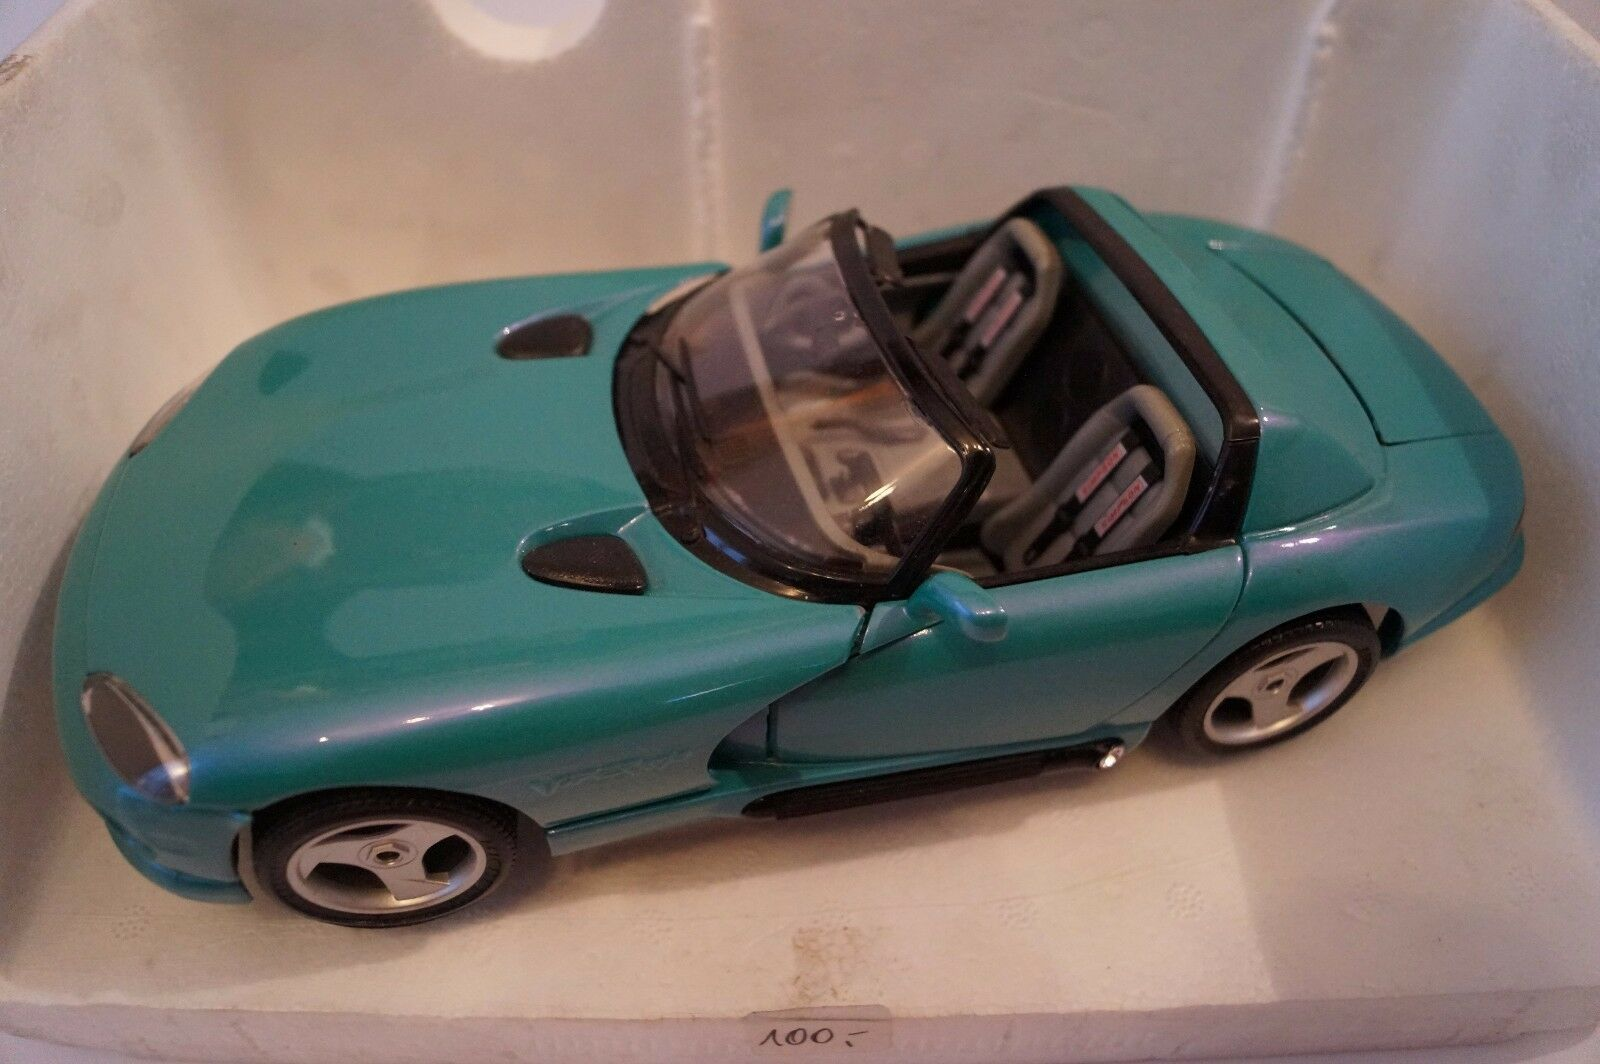 BURAGO voiture miniature 1 18 DODGE viper rt 10 spécial vernis  en OVP